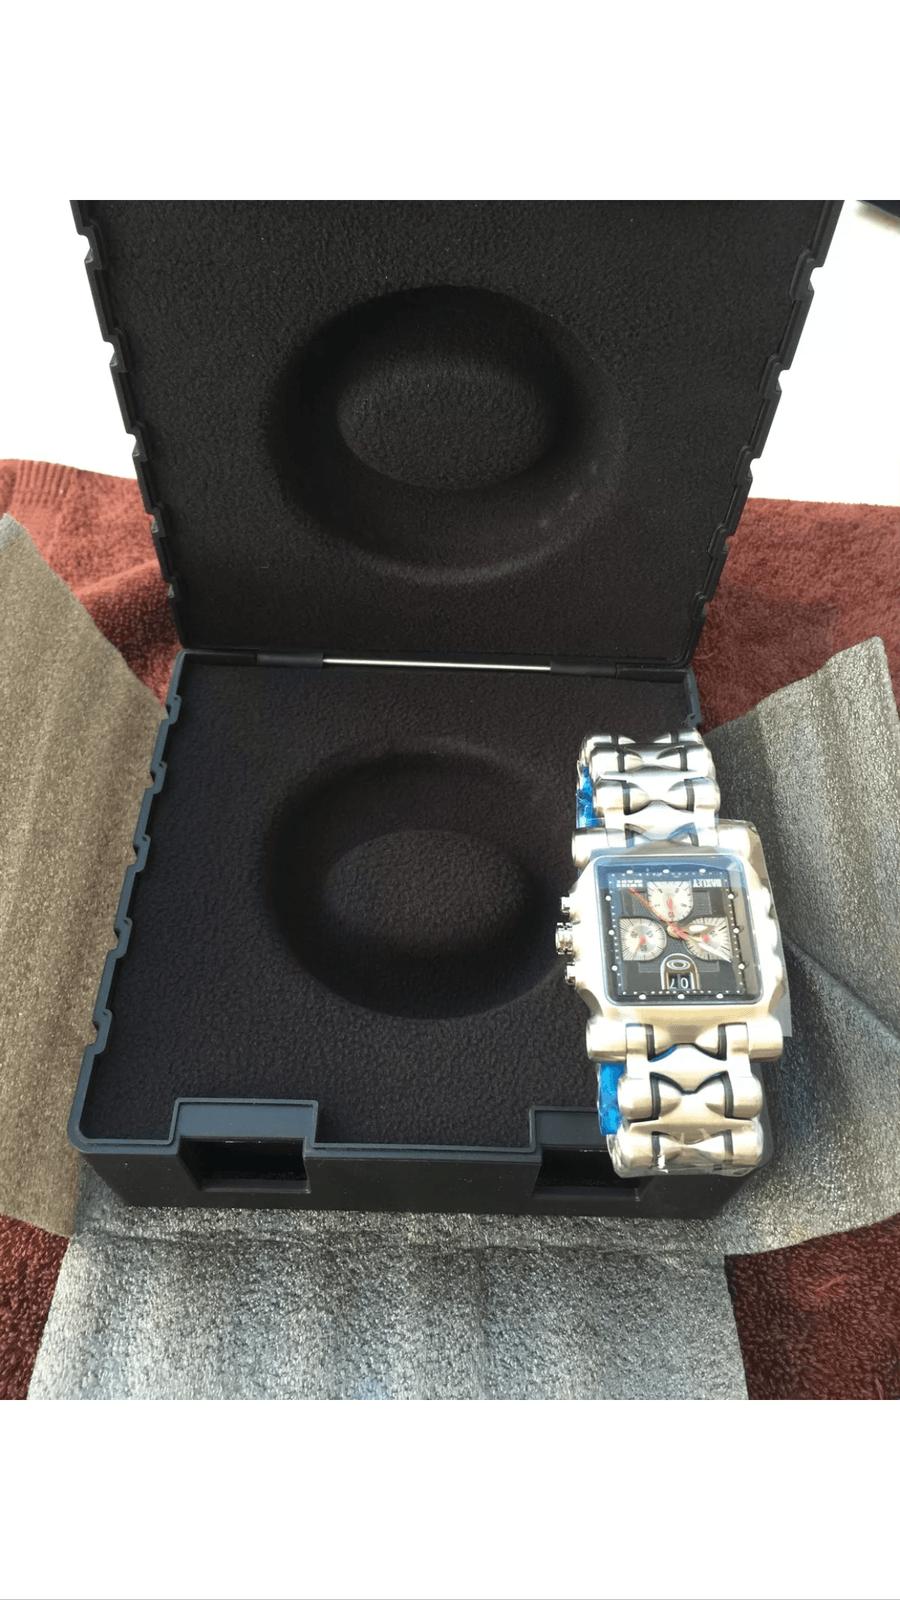 Minute Machine titanium bracelet black dial SKU# 10-193 - image2.png